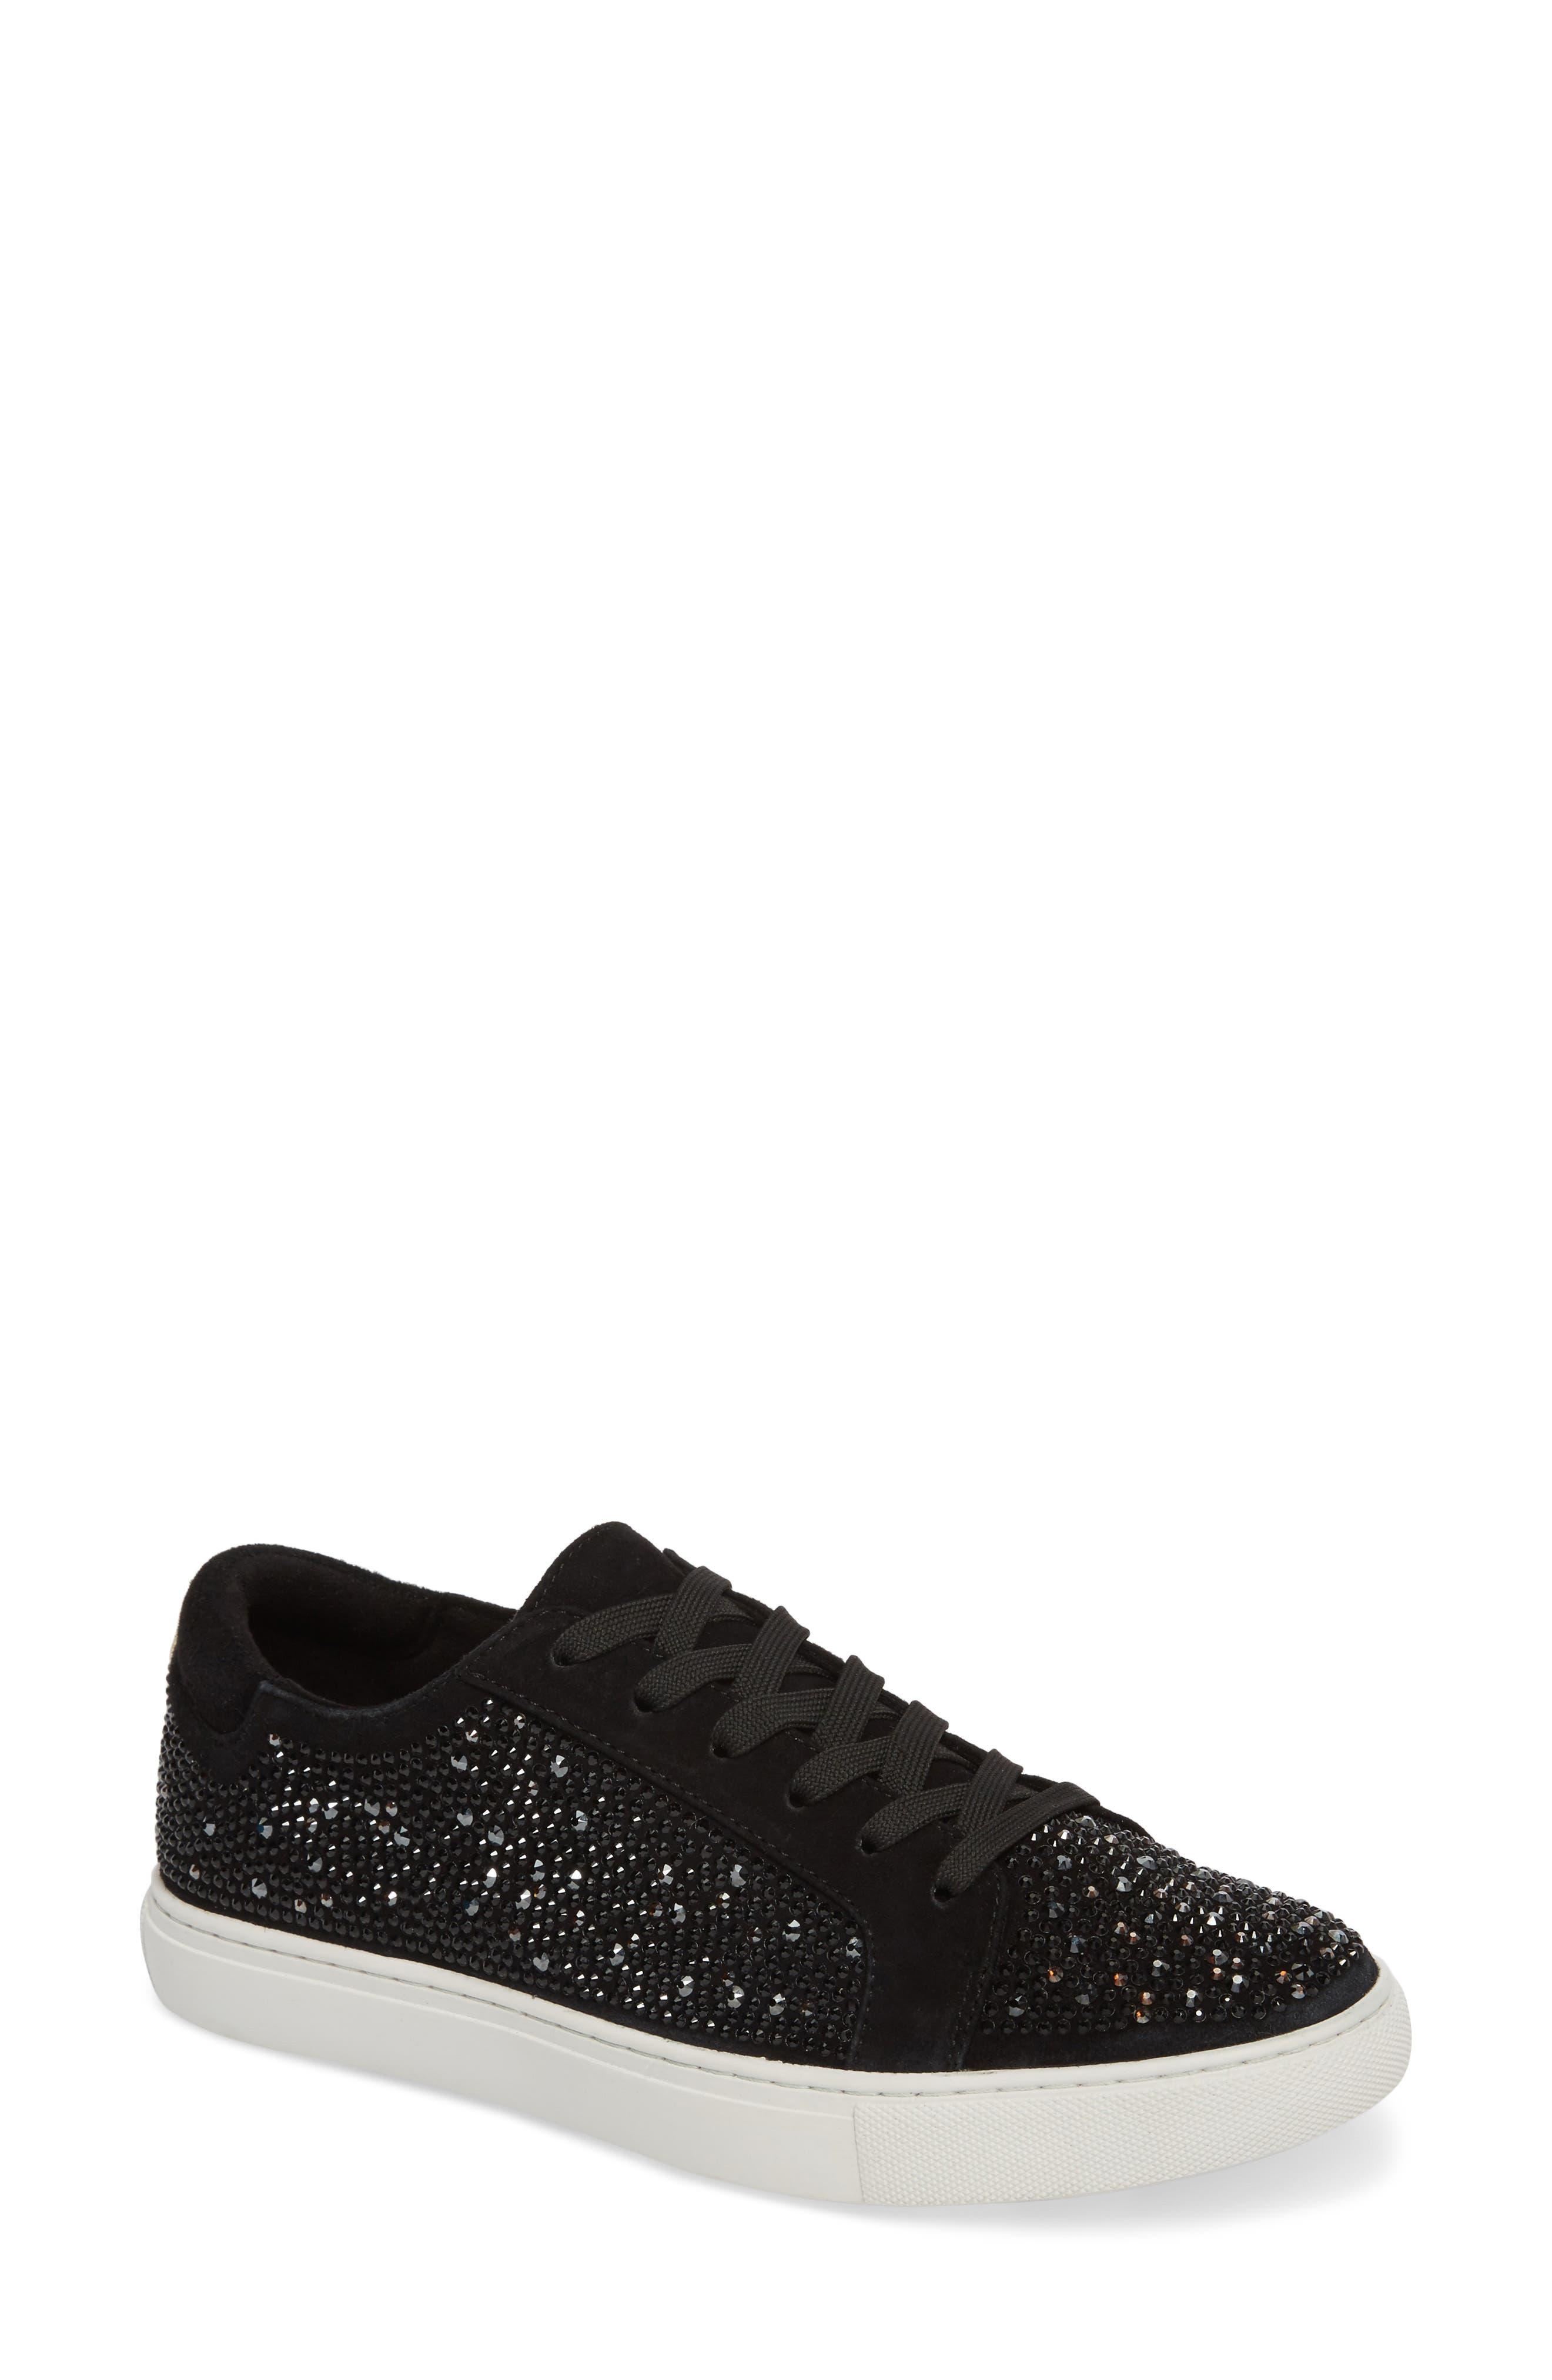 Kam Crystal Sneaker,                             Main thumbnail 1, color,                             001